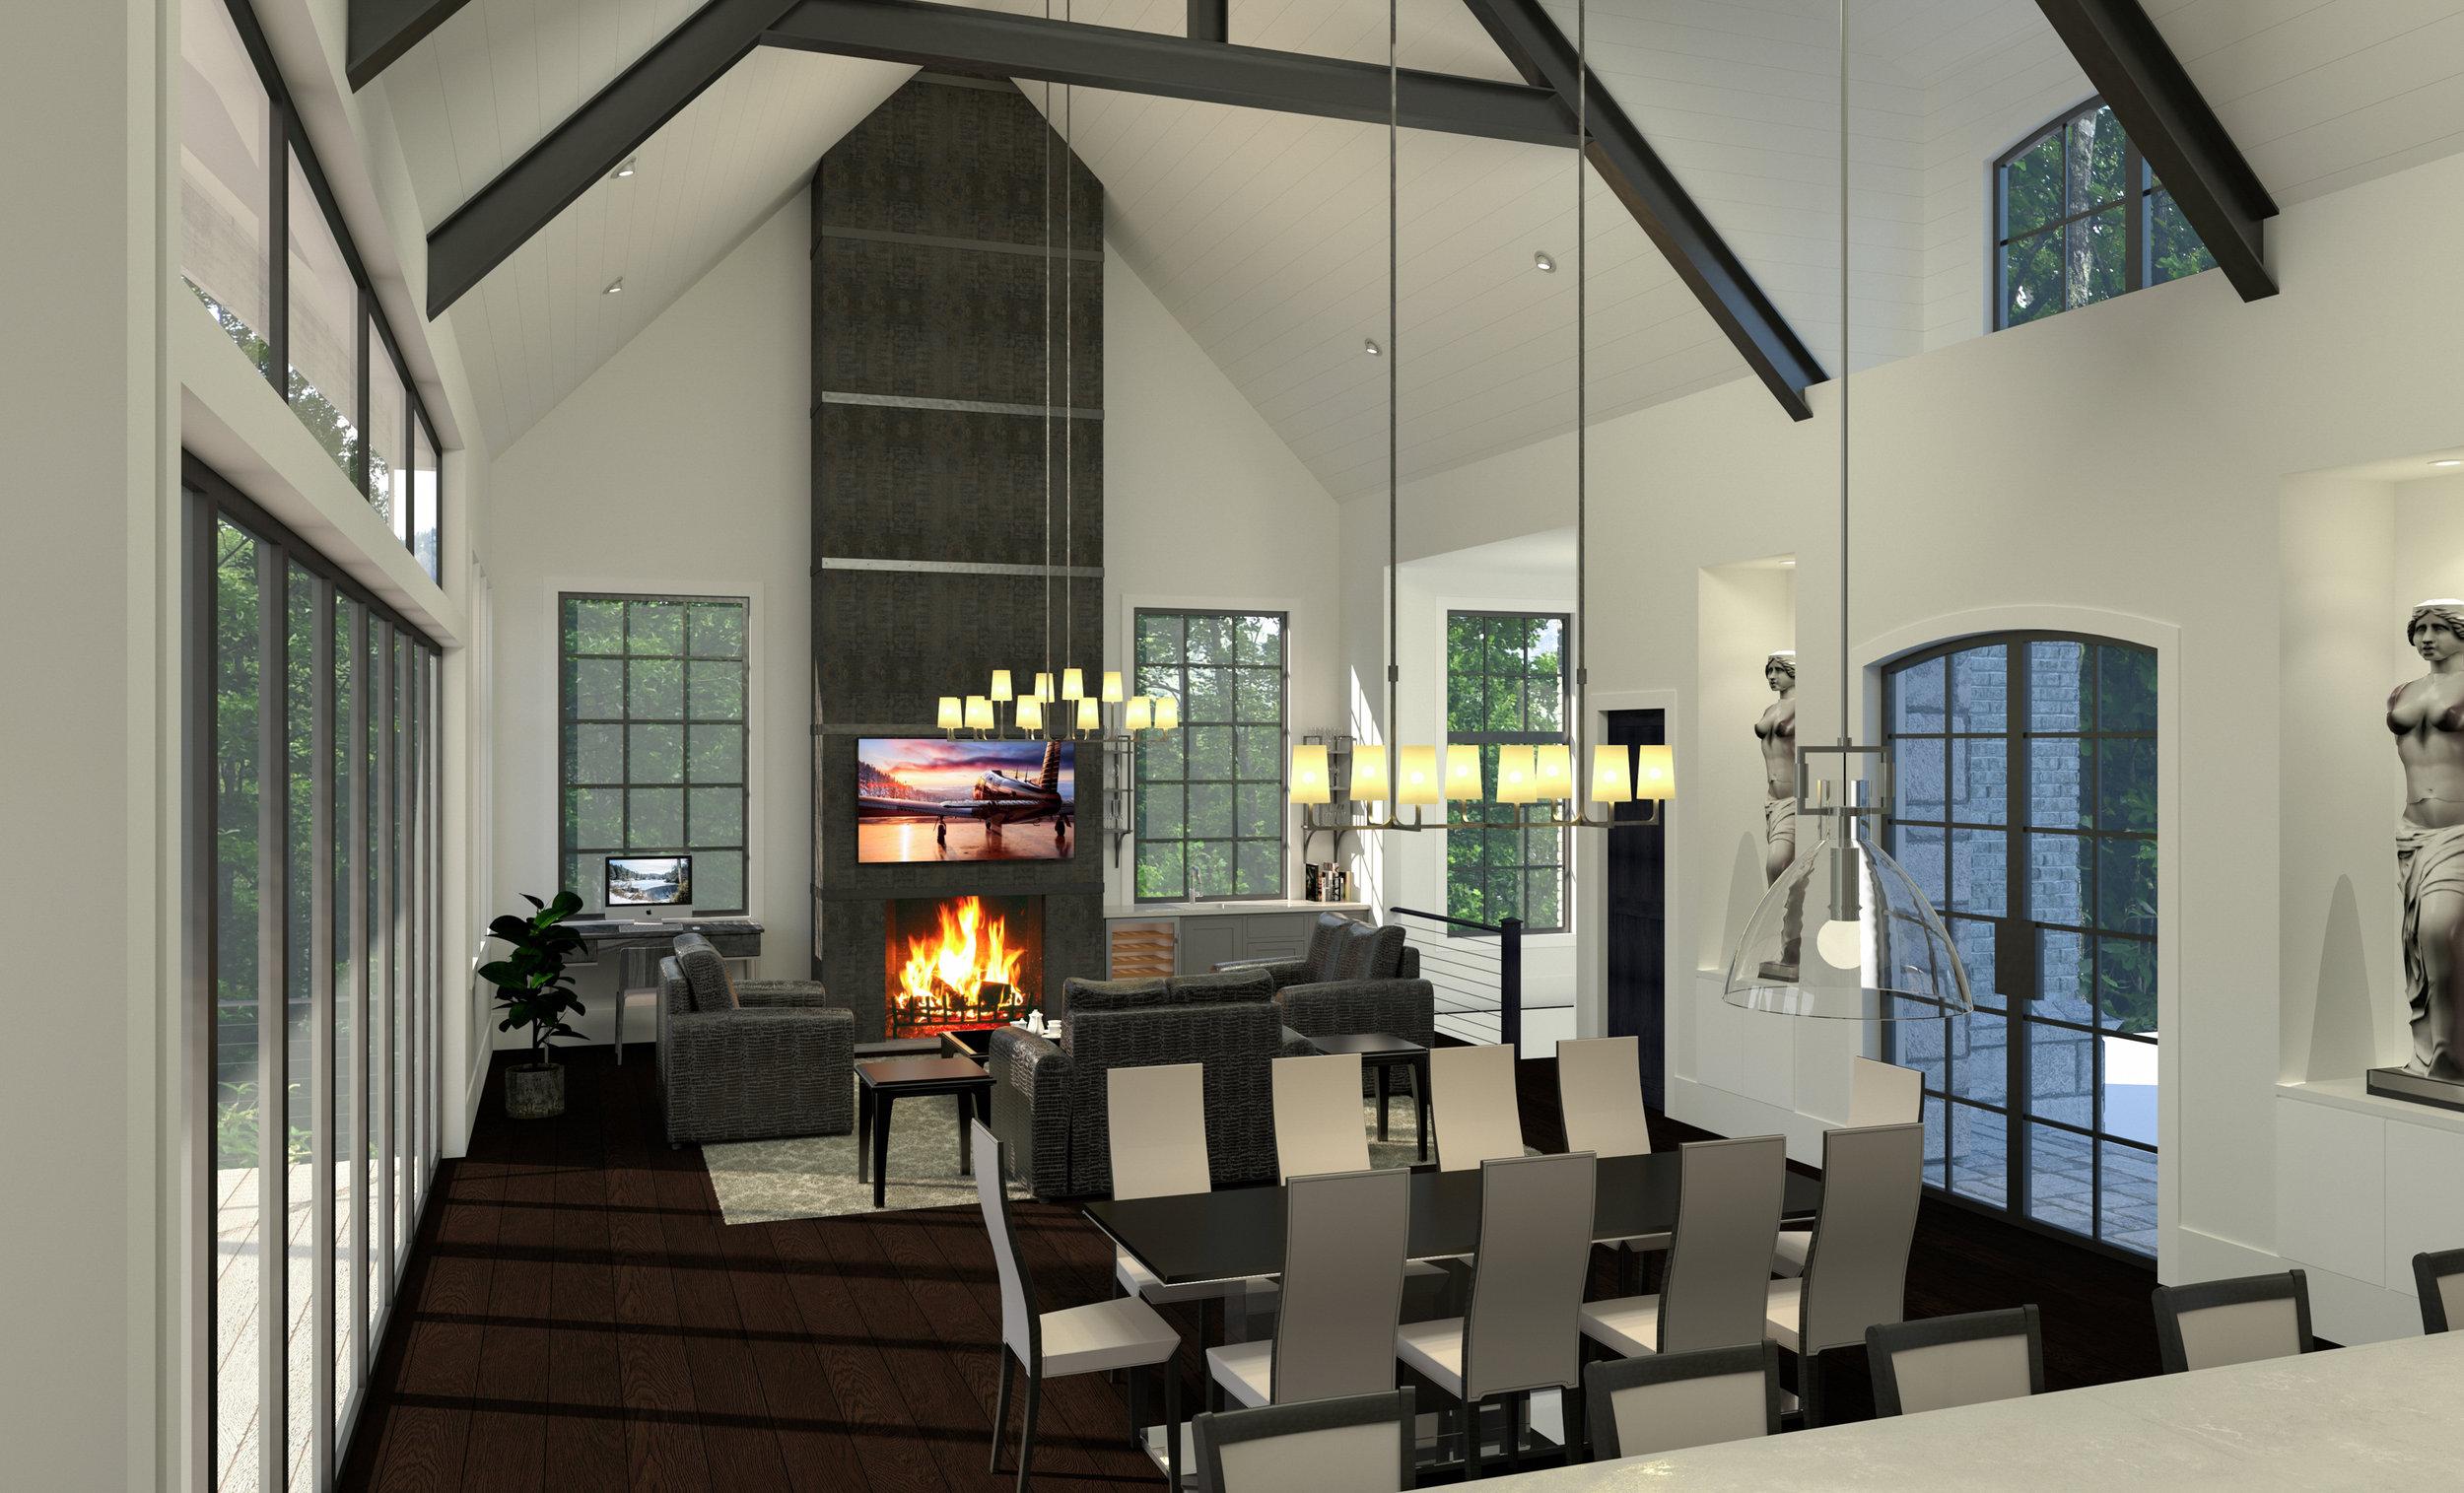 Residence 3 Fireplace.jpg